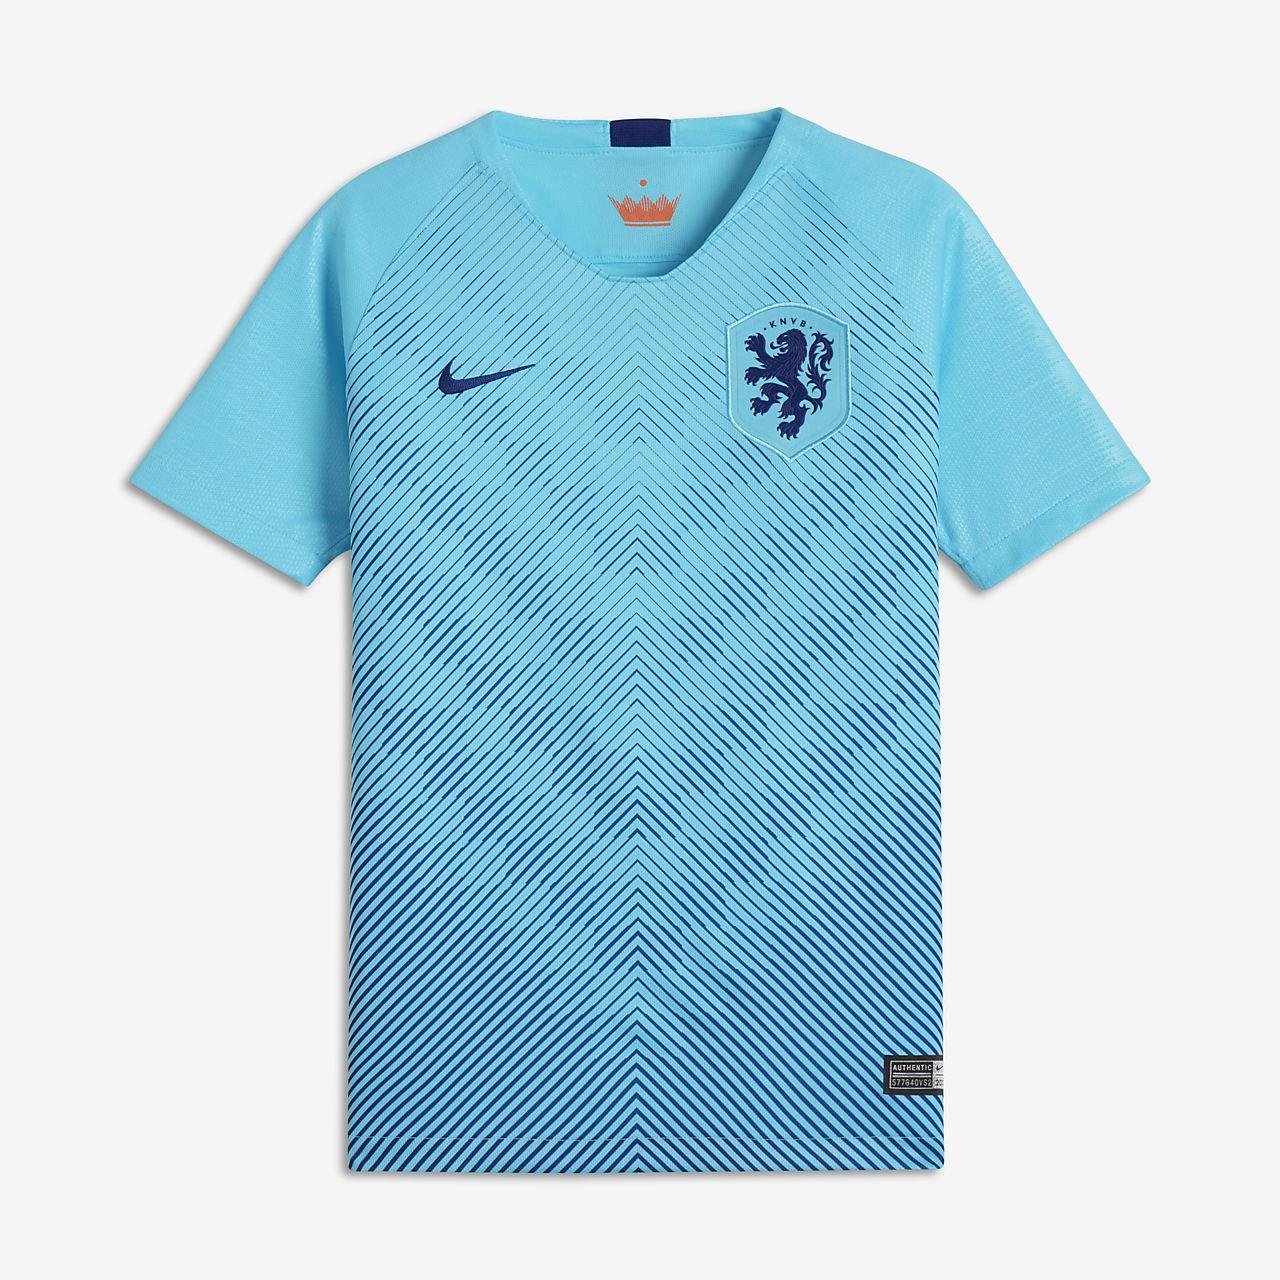 2018 Niederlande Stadium Away Fußballtrikot für ältere Kinder